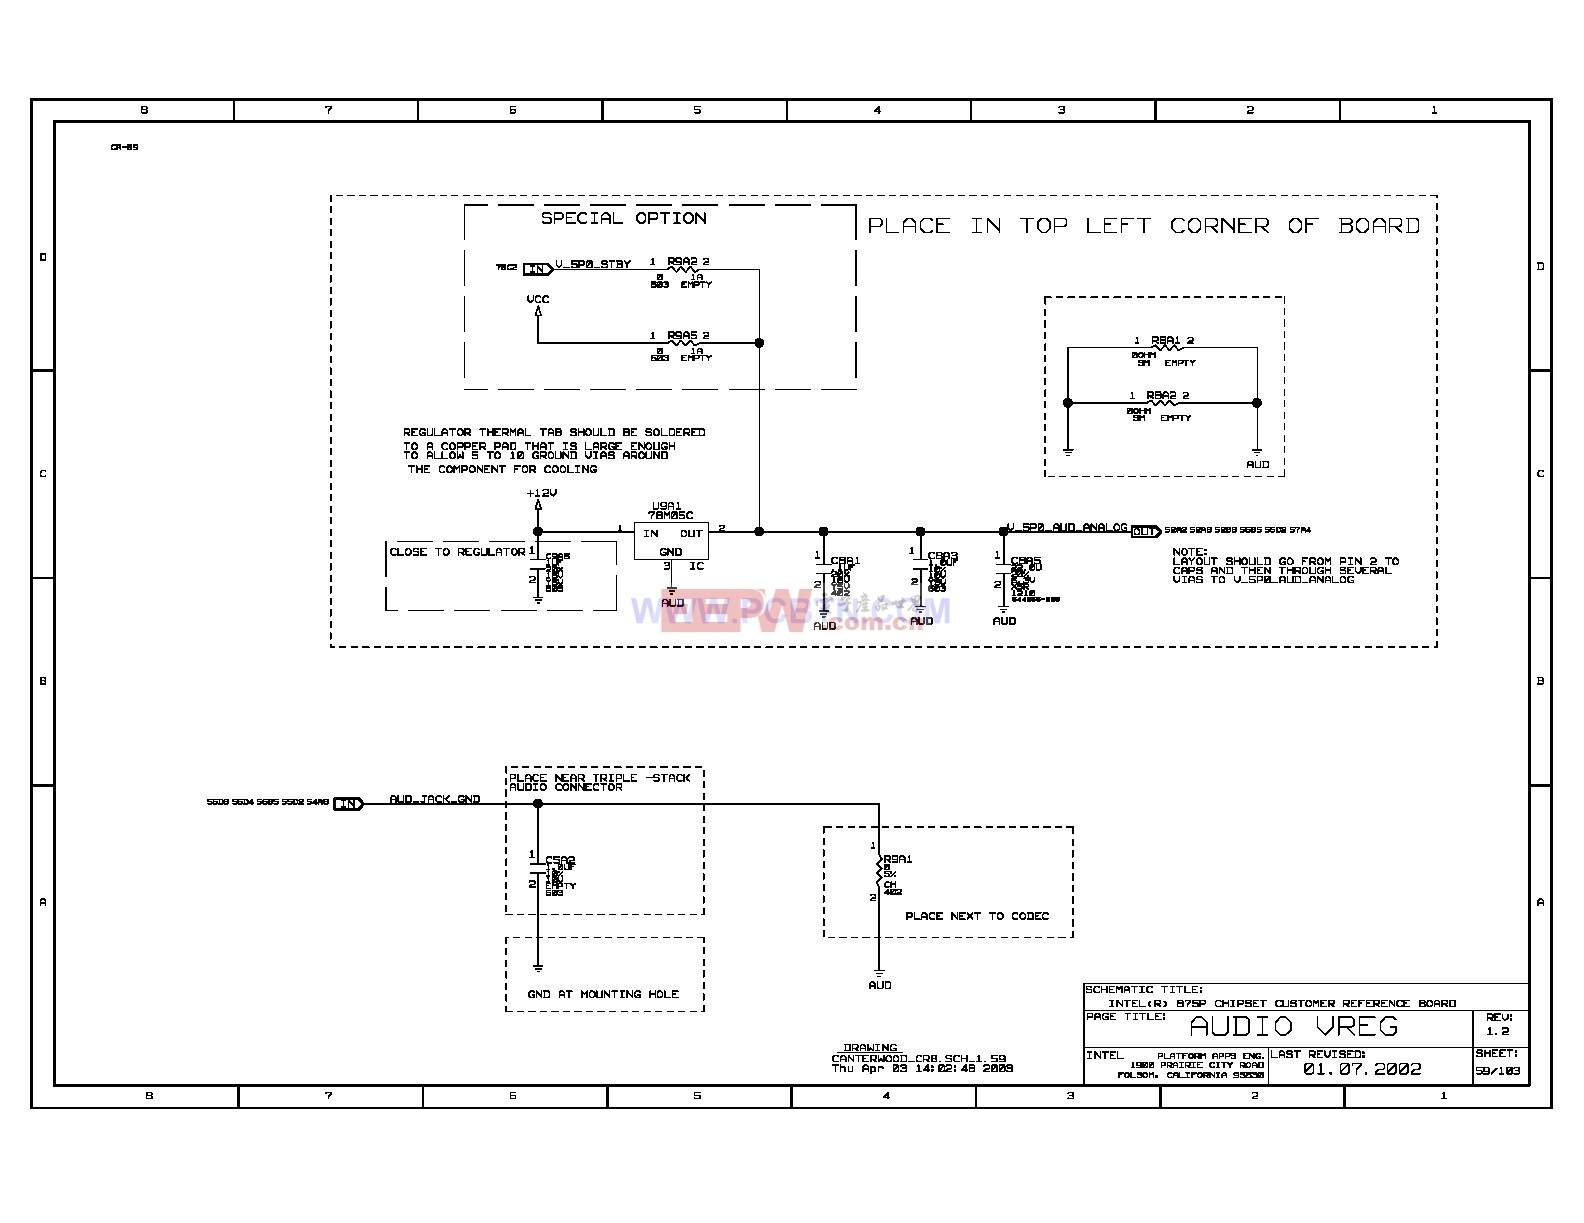 Intel 875p主板音頻調整電壓電路圖